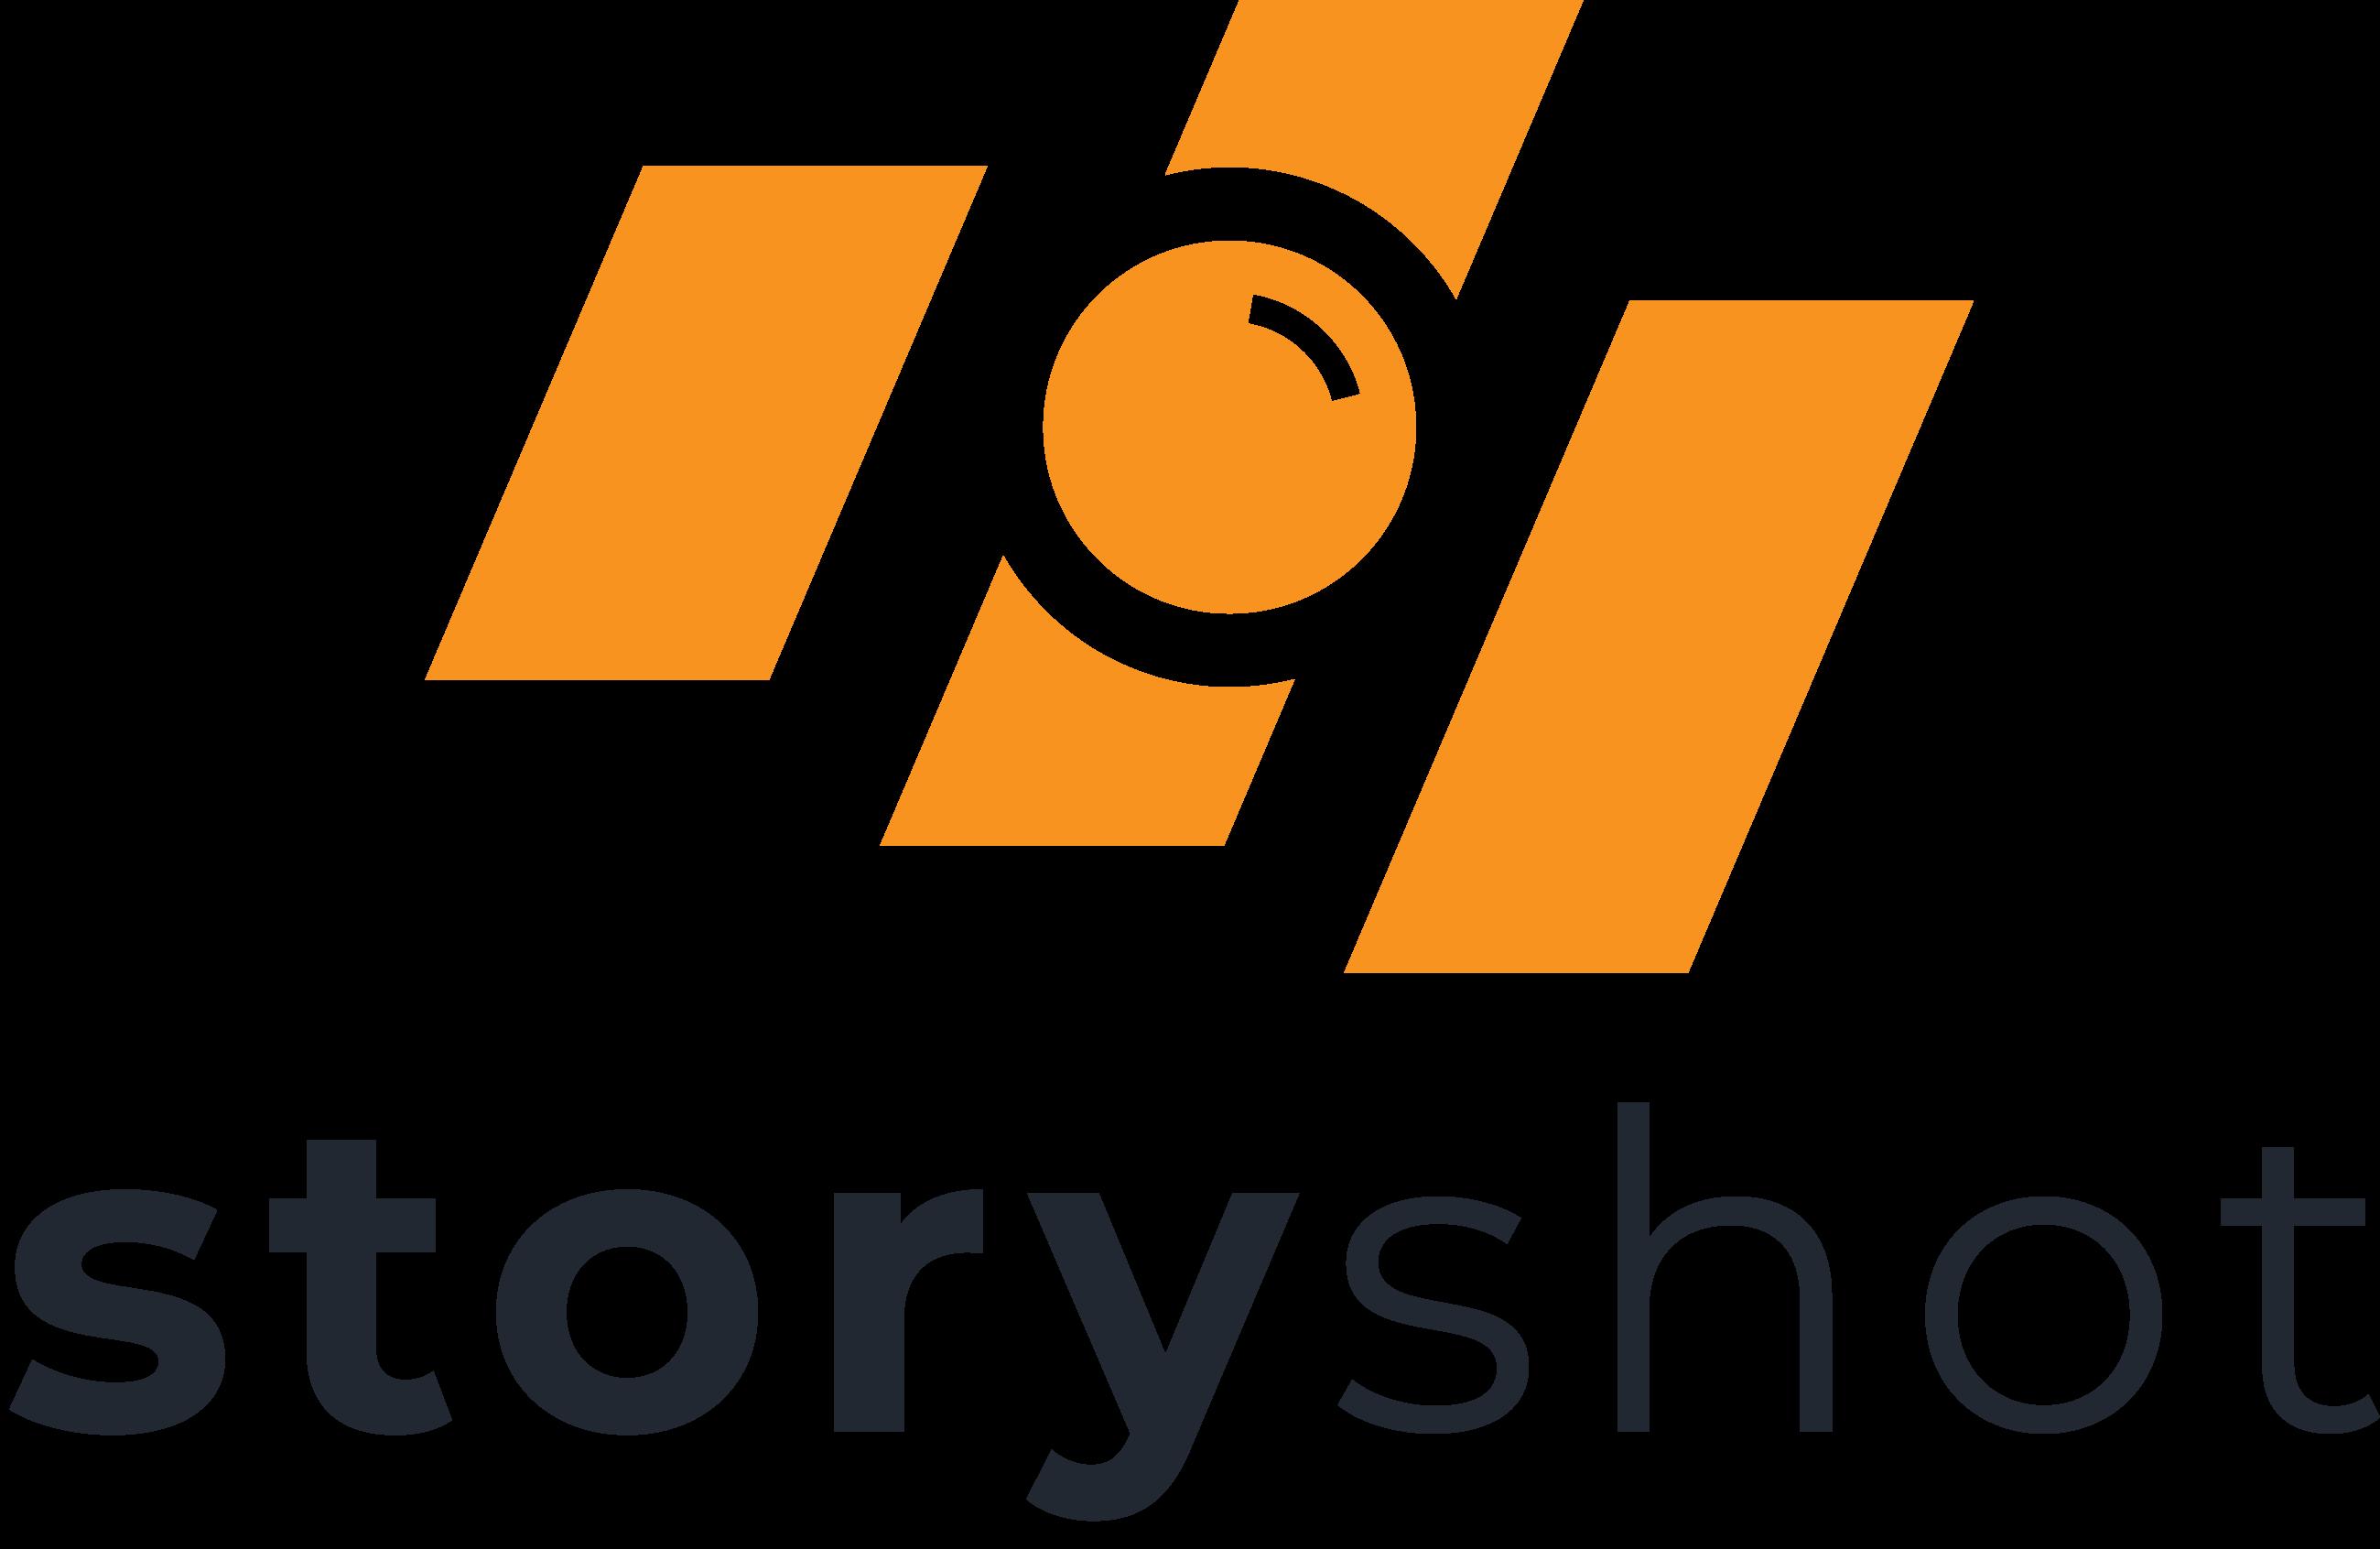 logo storyshot